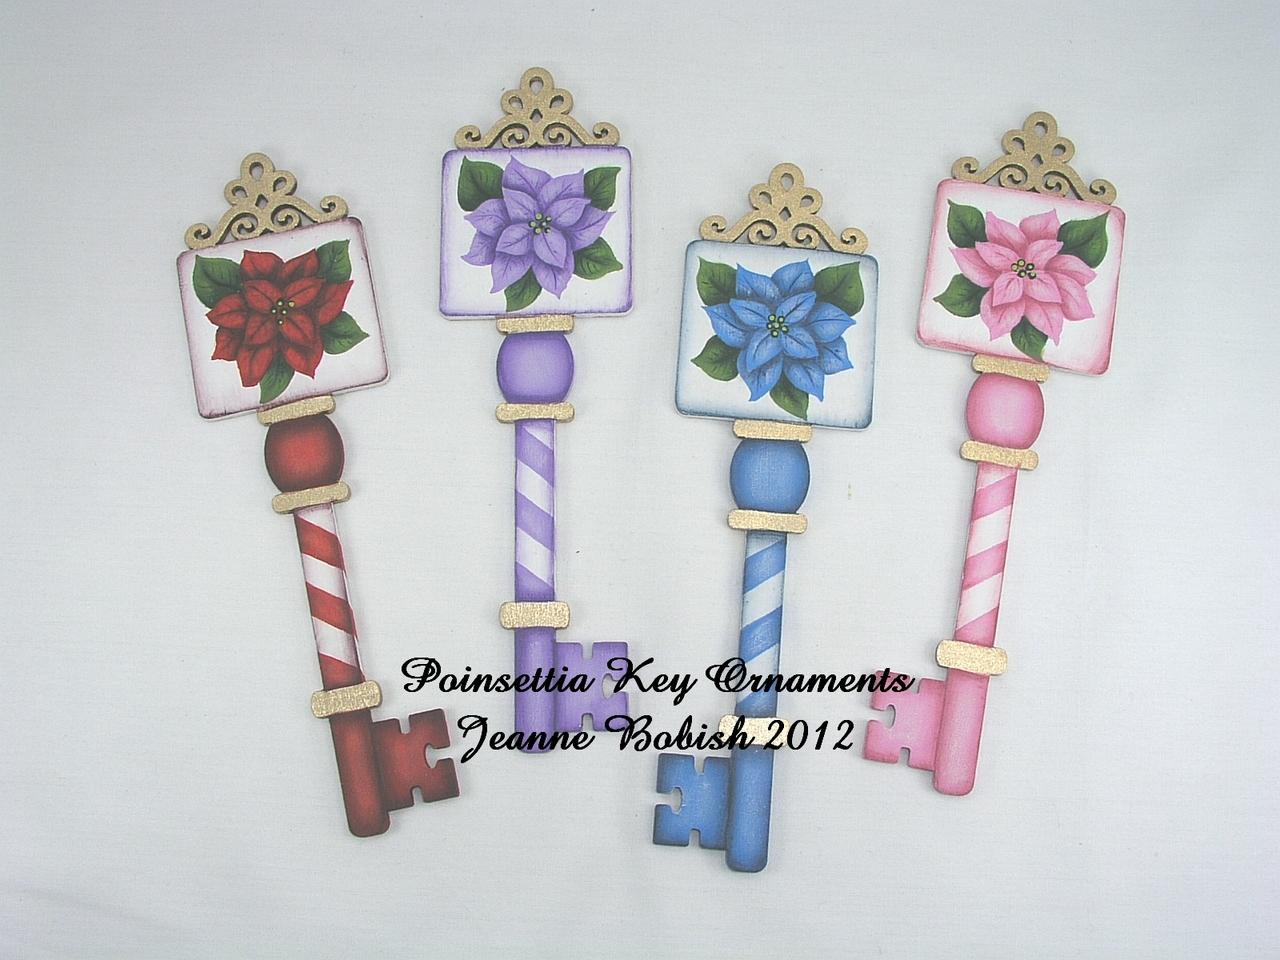 Poinsettia Key Ornaments - E-Packet - Jeanne Bobish